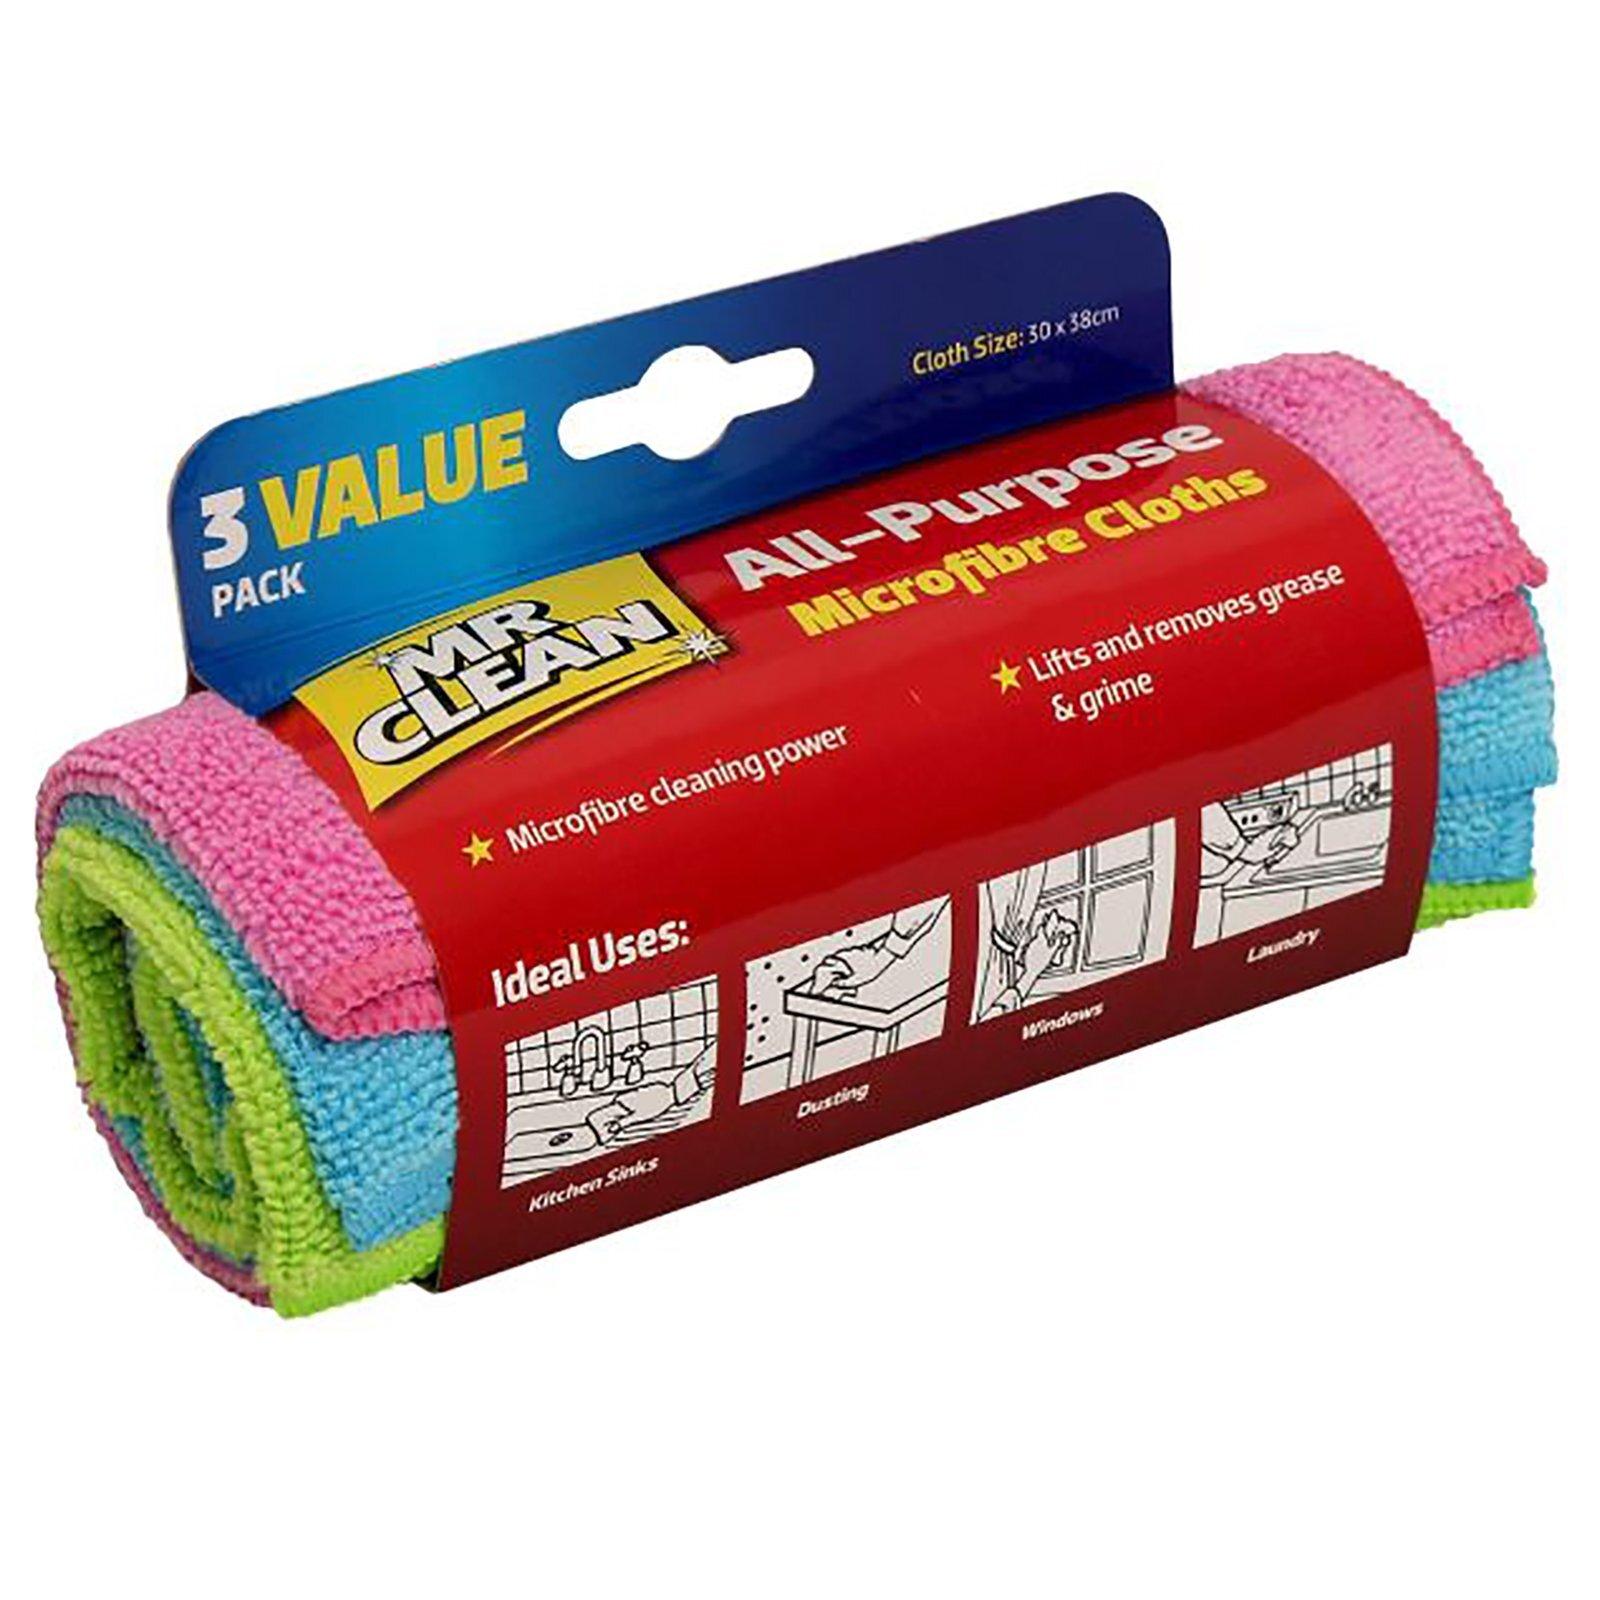 Mr Clean All Purpose Microfibre Cloths - 3 Pack